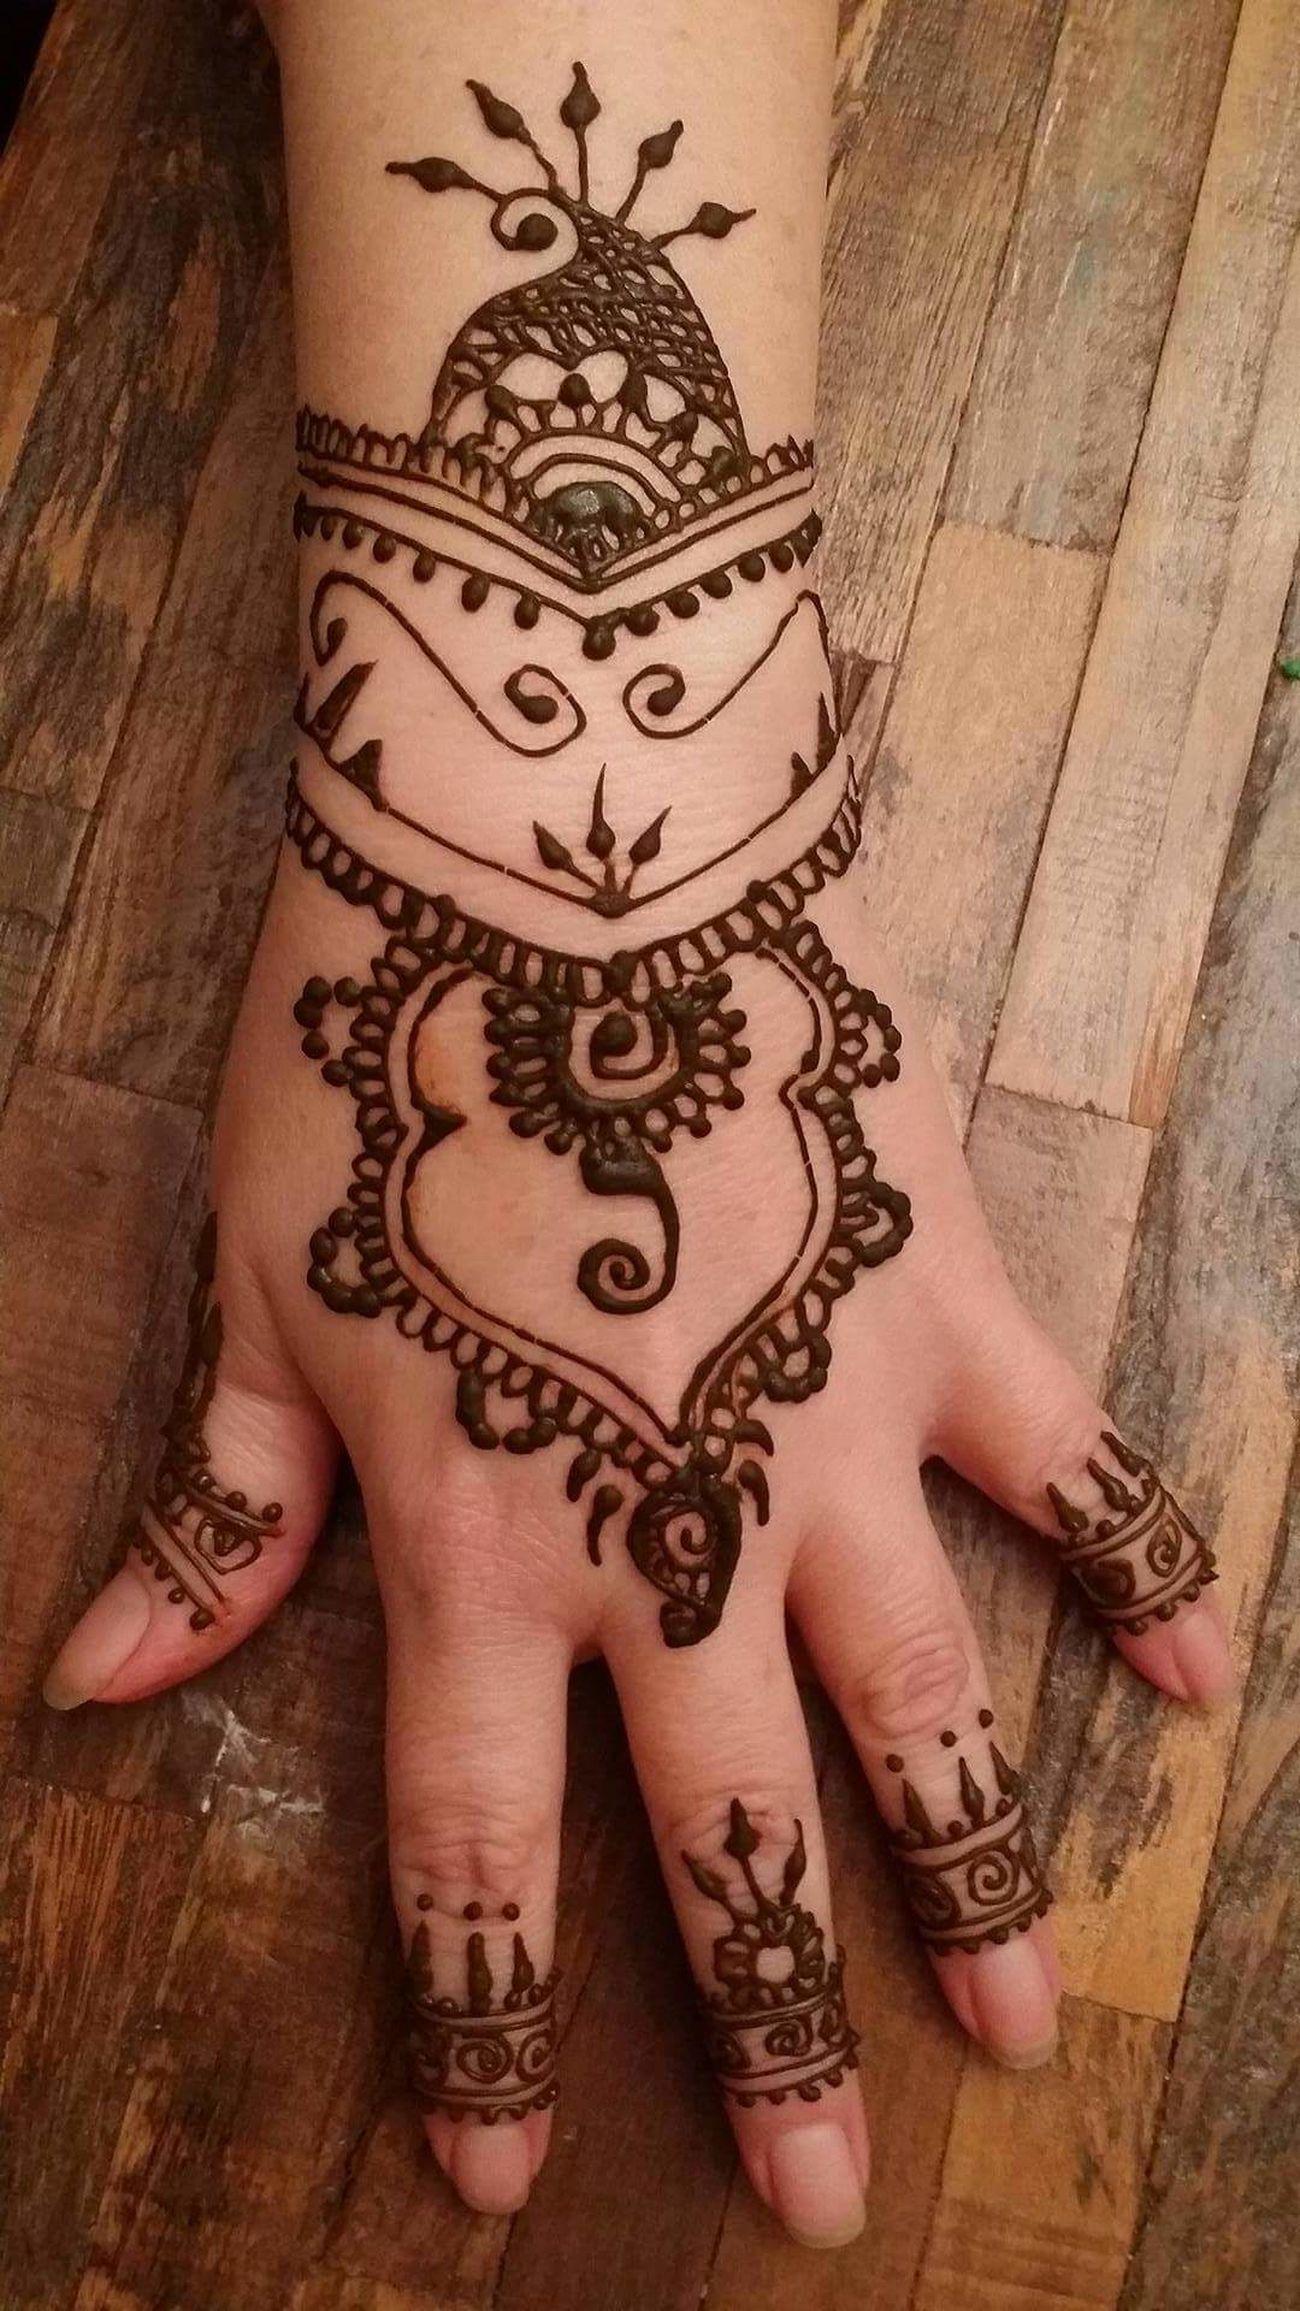 Art And Craft Tattoo Design Culture Creativity Mehndi MehndiDesign MehndiTattoos Punjabistyle Henna Tattoo Human Skin Punjabiculture Human Finger Art And Craft My Work